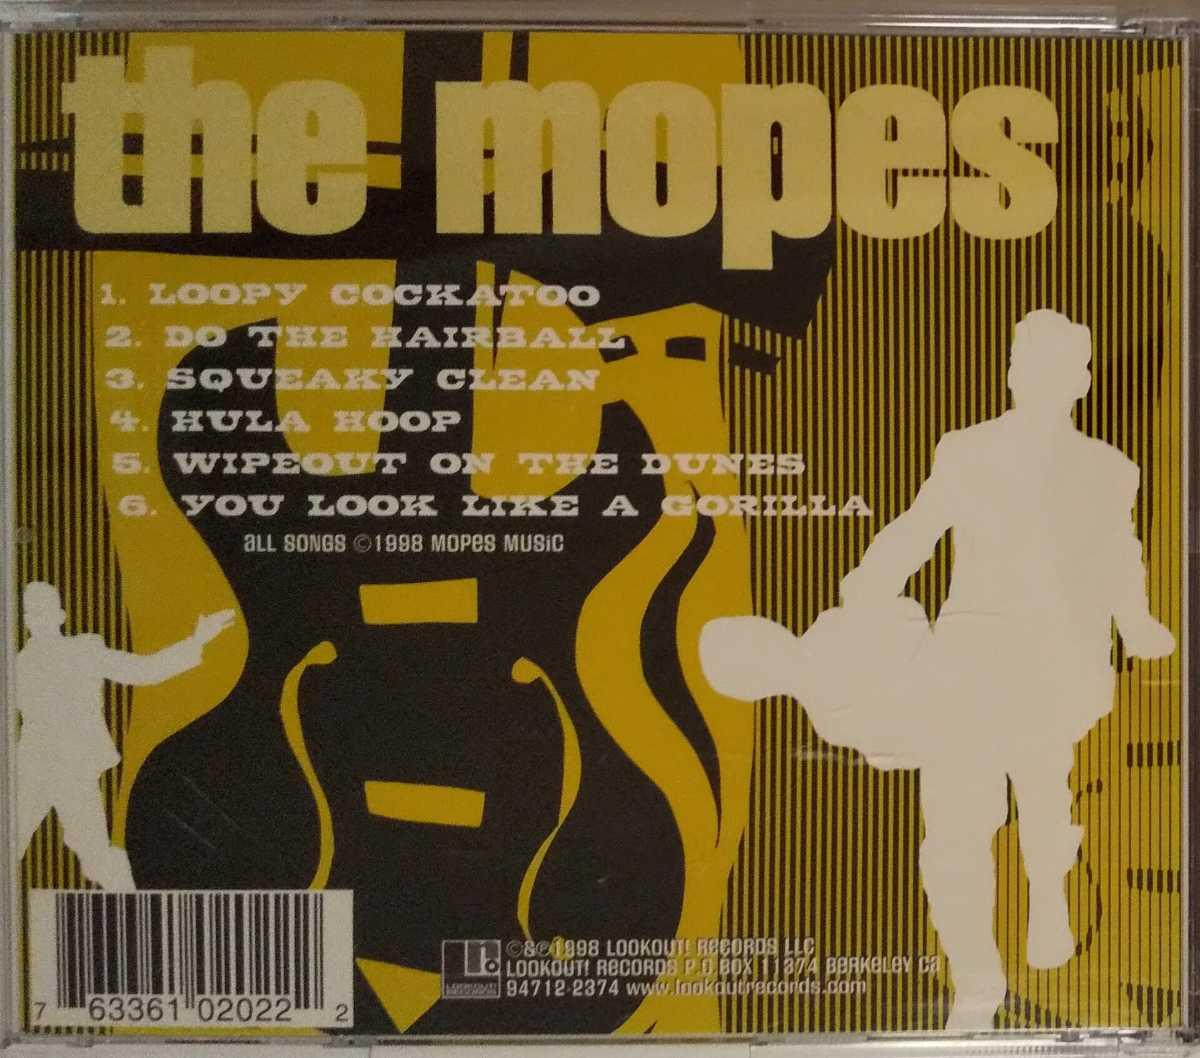 The Mopes Lowdown Two-Bit Sidewinder! CD Pop Punk Screeching Weasel Queers